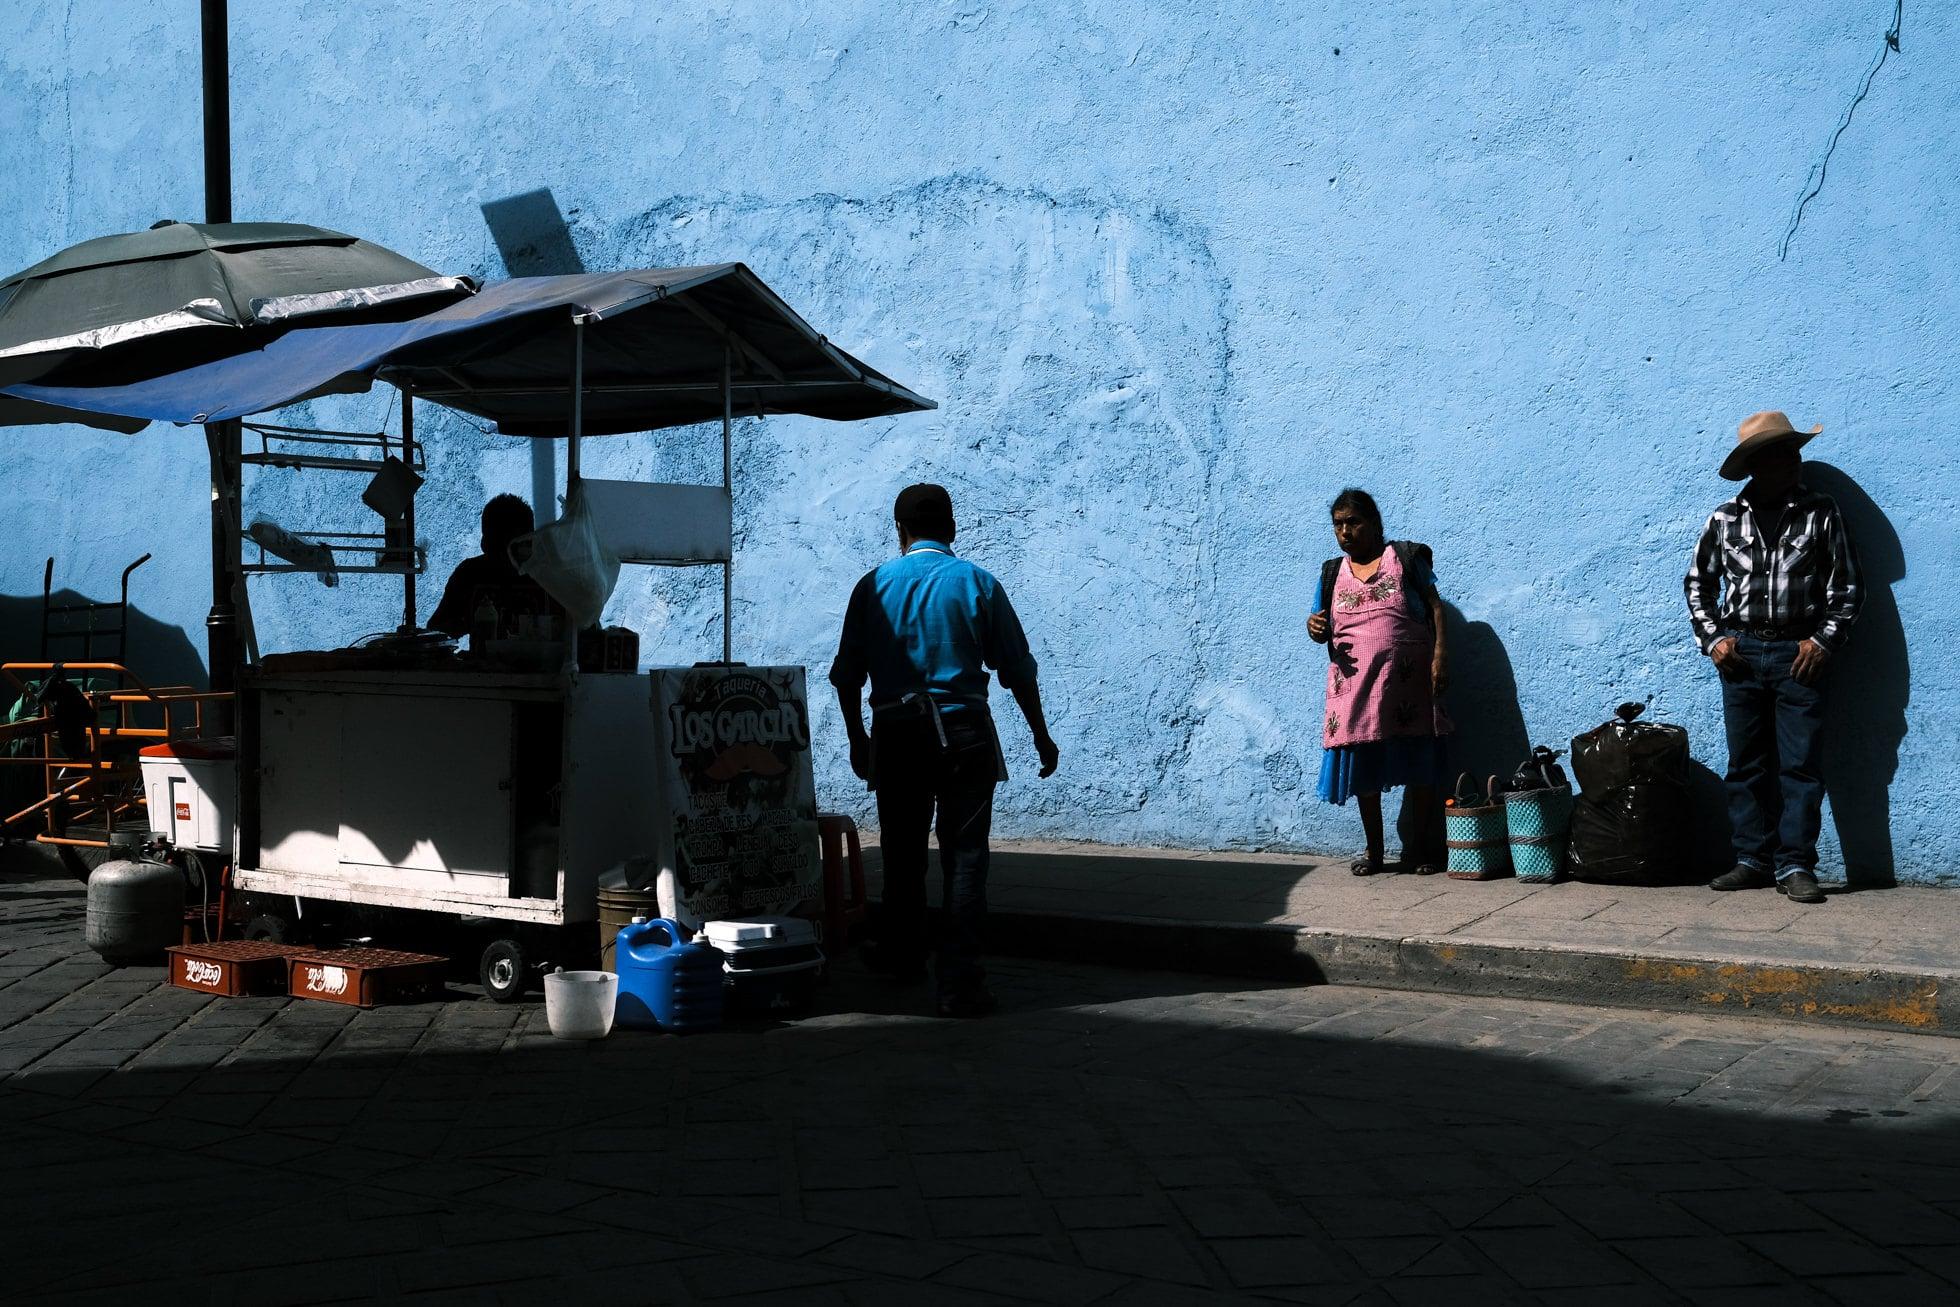 fujifilm-x-pro3-mexico-street-photography-52